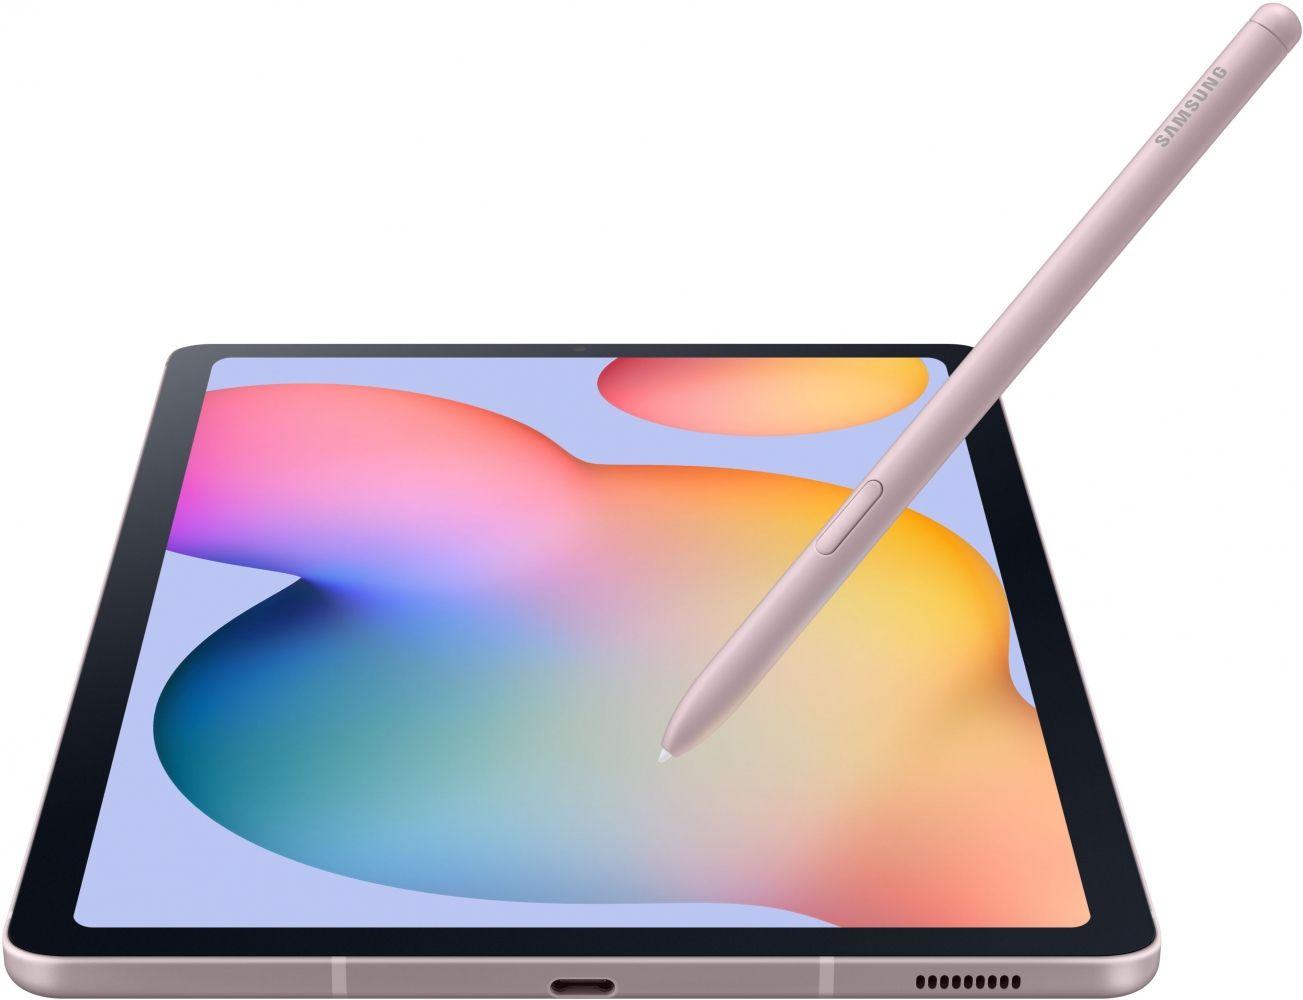 Планшет Samsung Galaxy Tab S6 Lite Wi-Fi 64GB (SM-P610NZIASEK) Pink от Територія твоєї техніки - 8